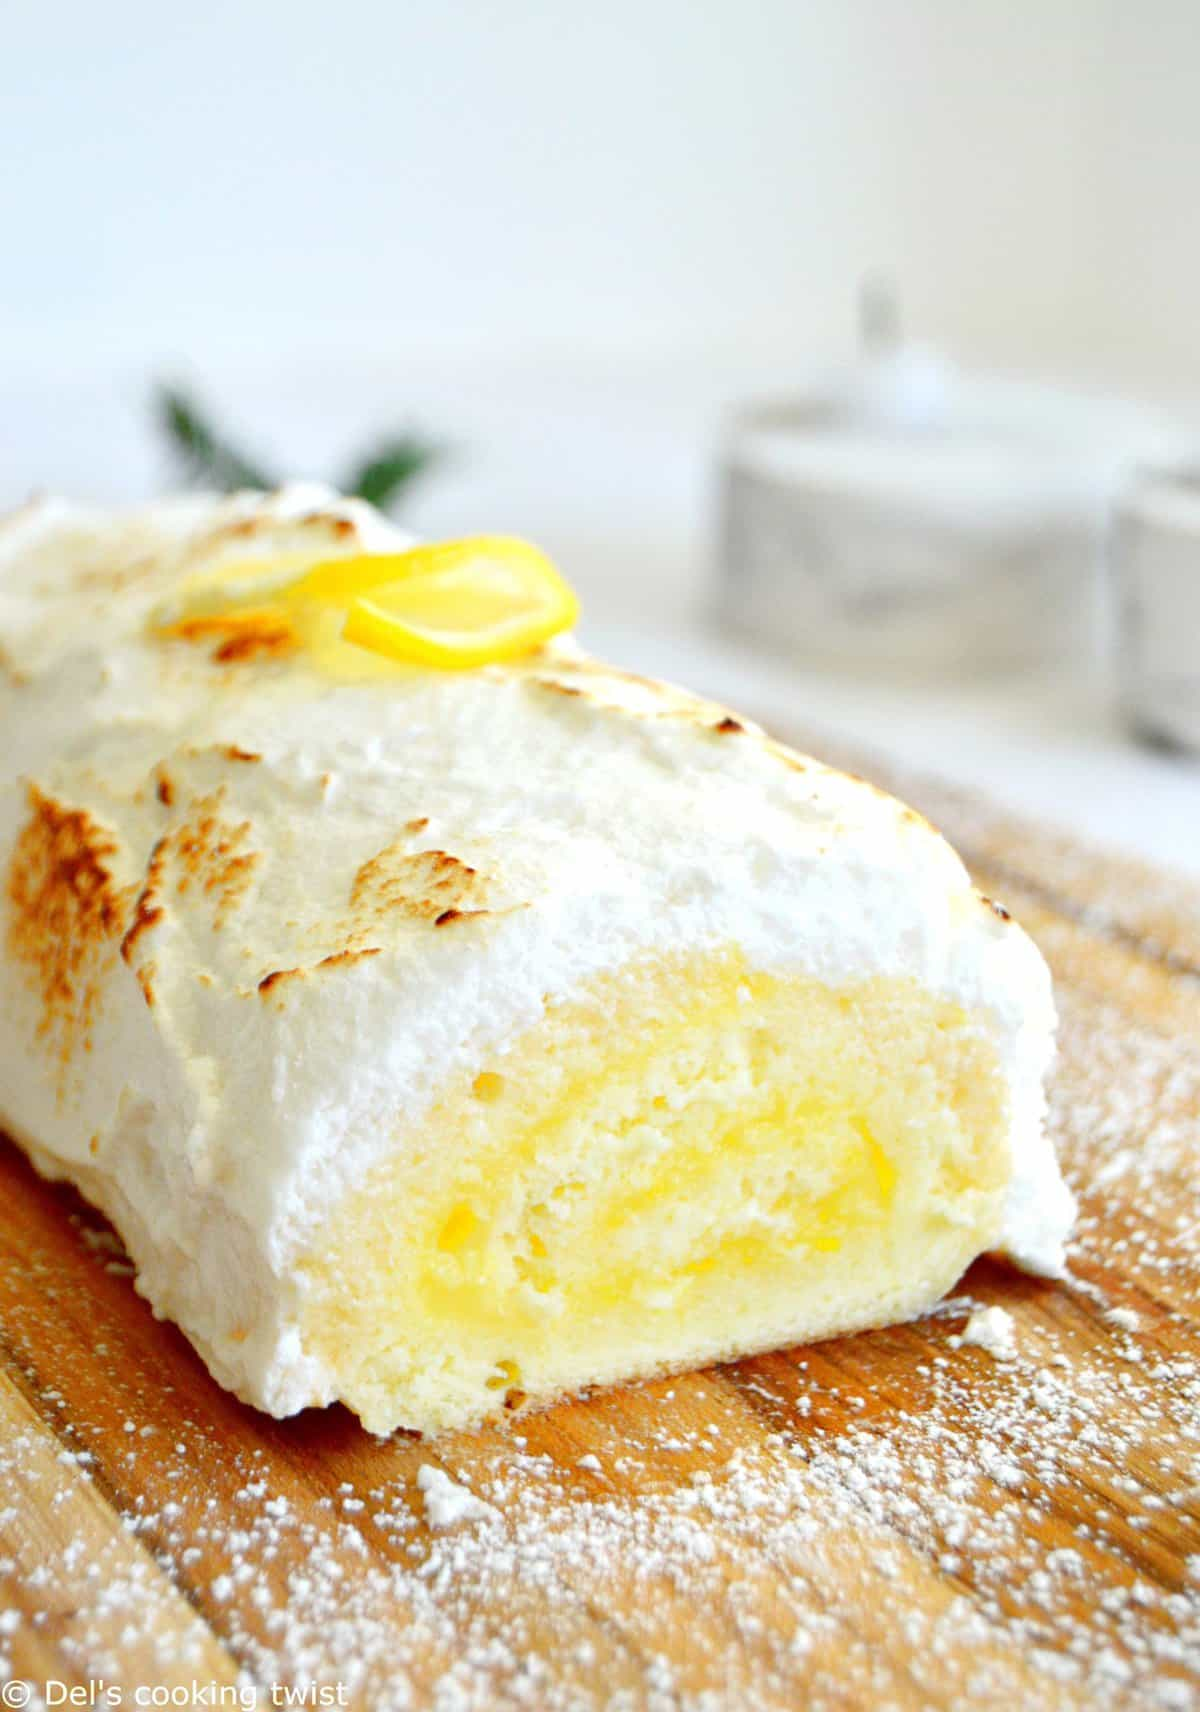 Bûche de Noel facon tarte au citron meringuée